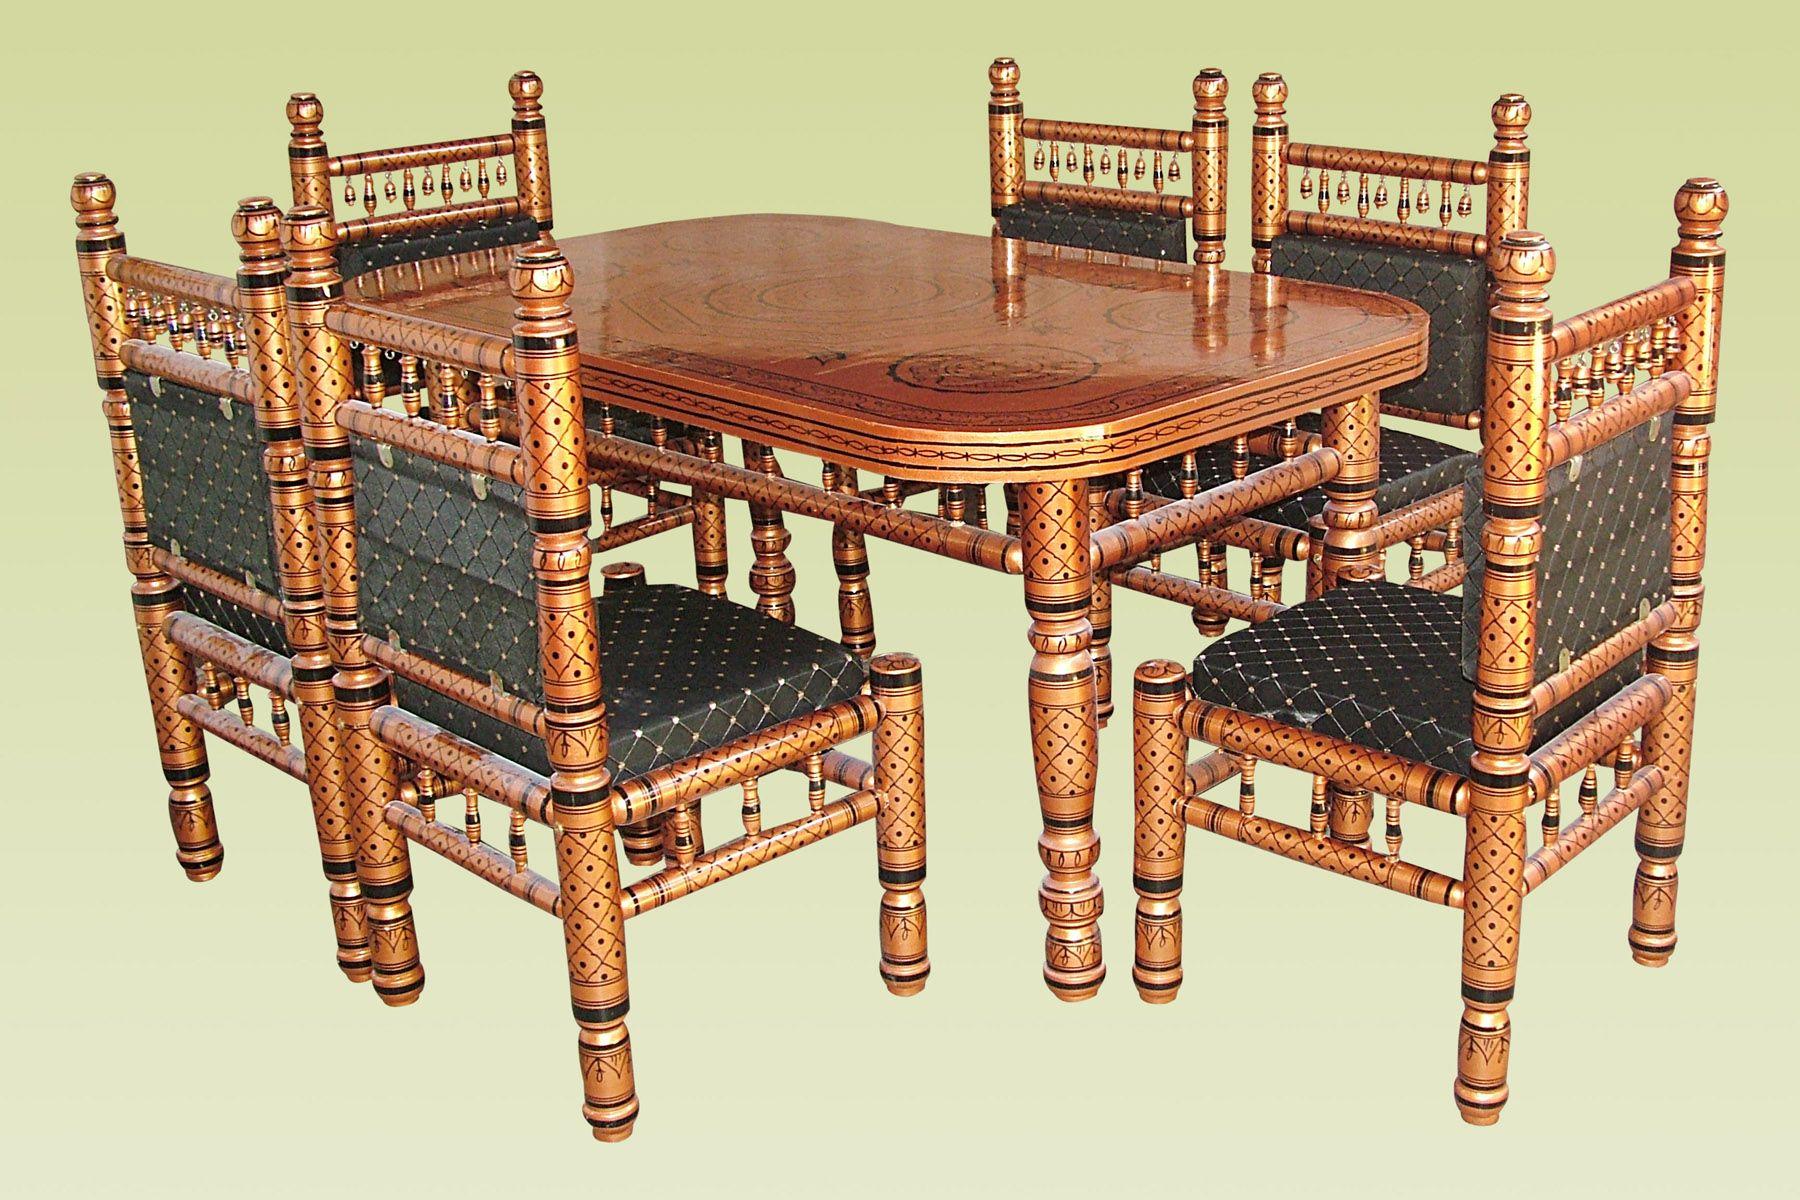 punjabi dining table furniture design ideas - Furniture Dining Table